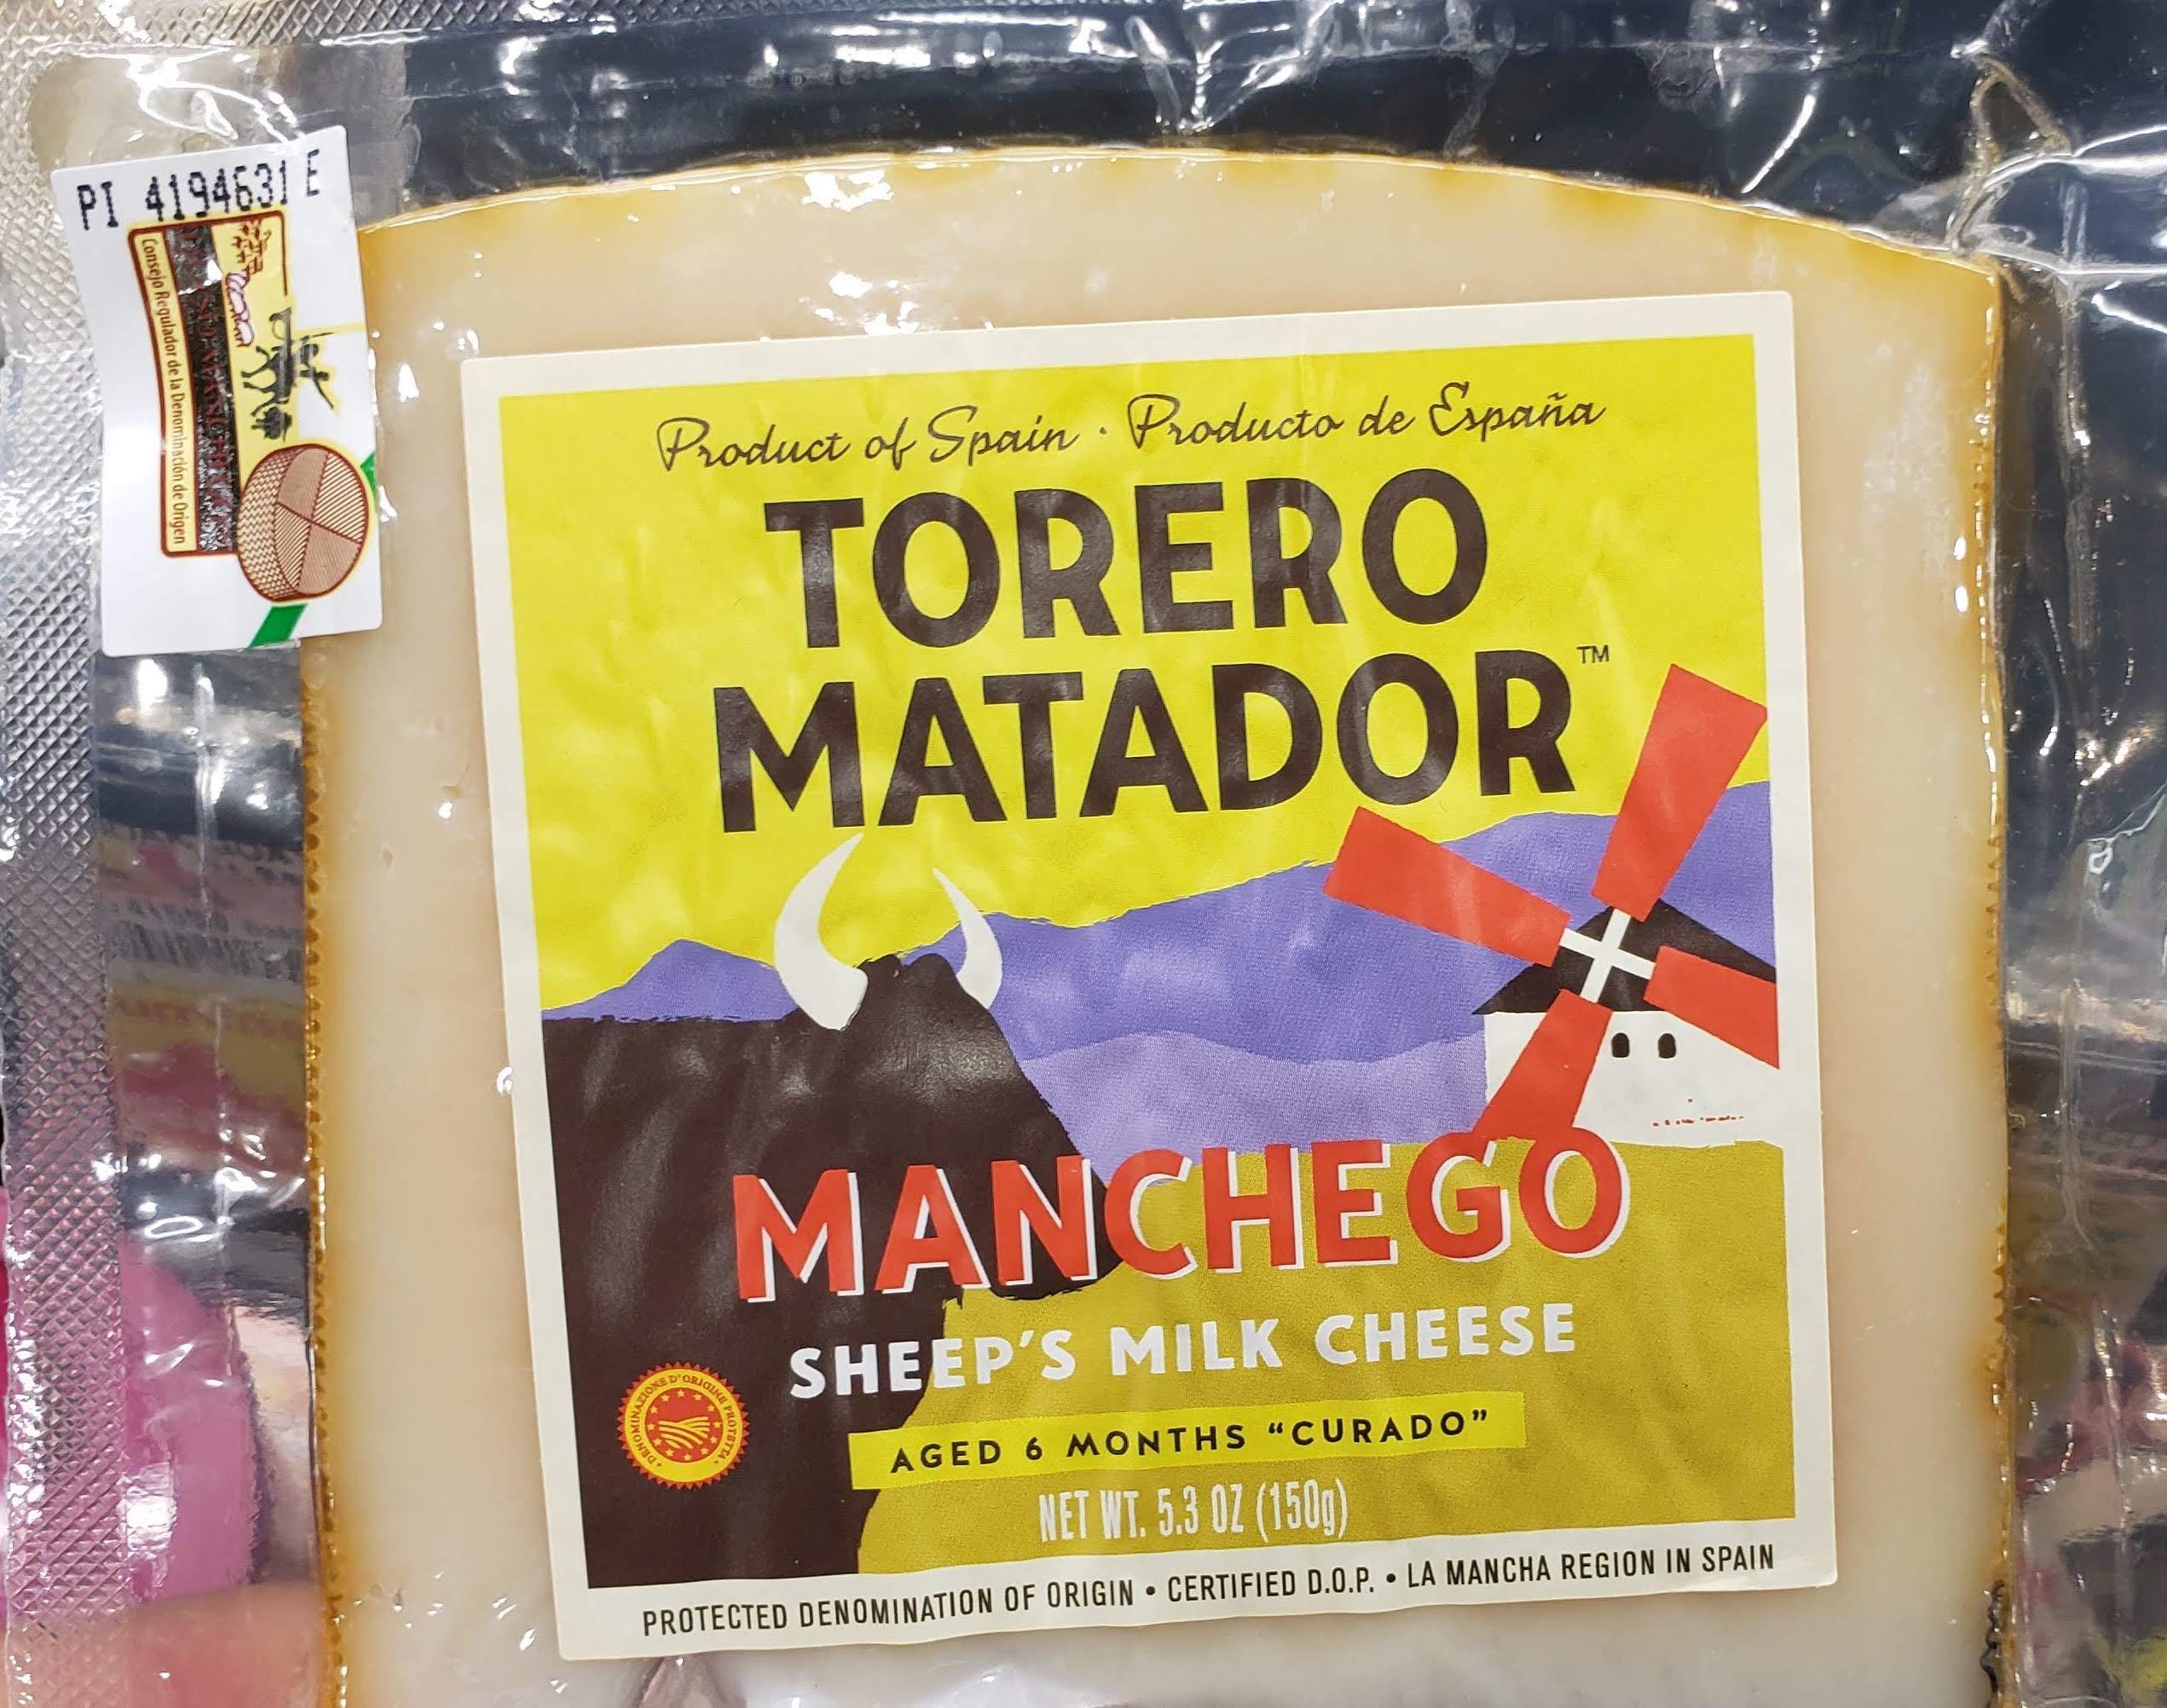 Torero Matador Manchego Sheep's Milk Cheese Aged for 6 Months Curado net 5.3oz Product of Spain